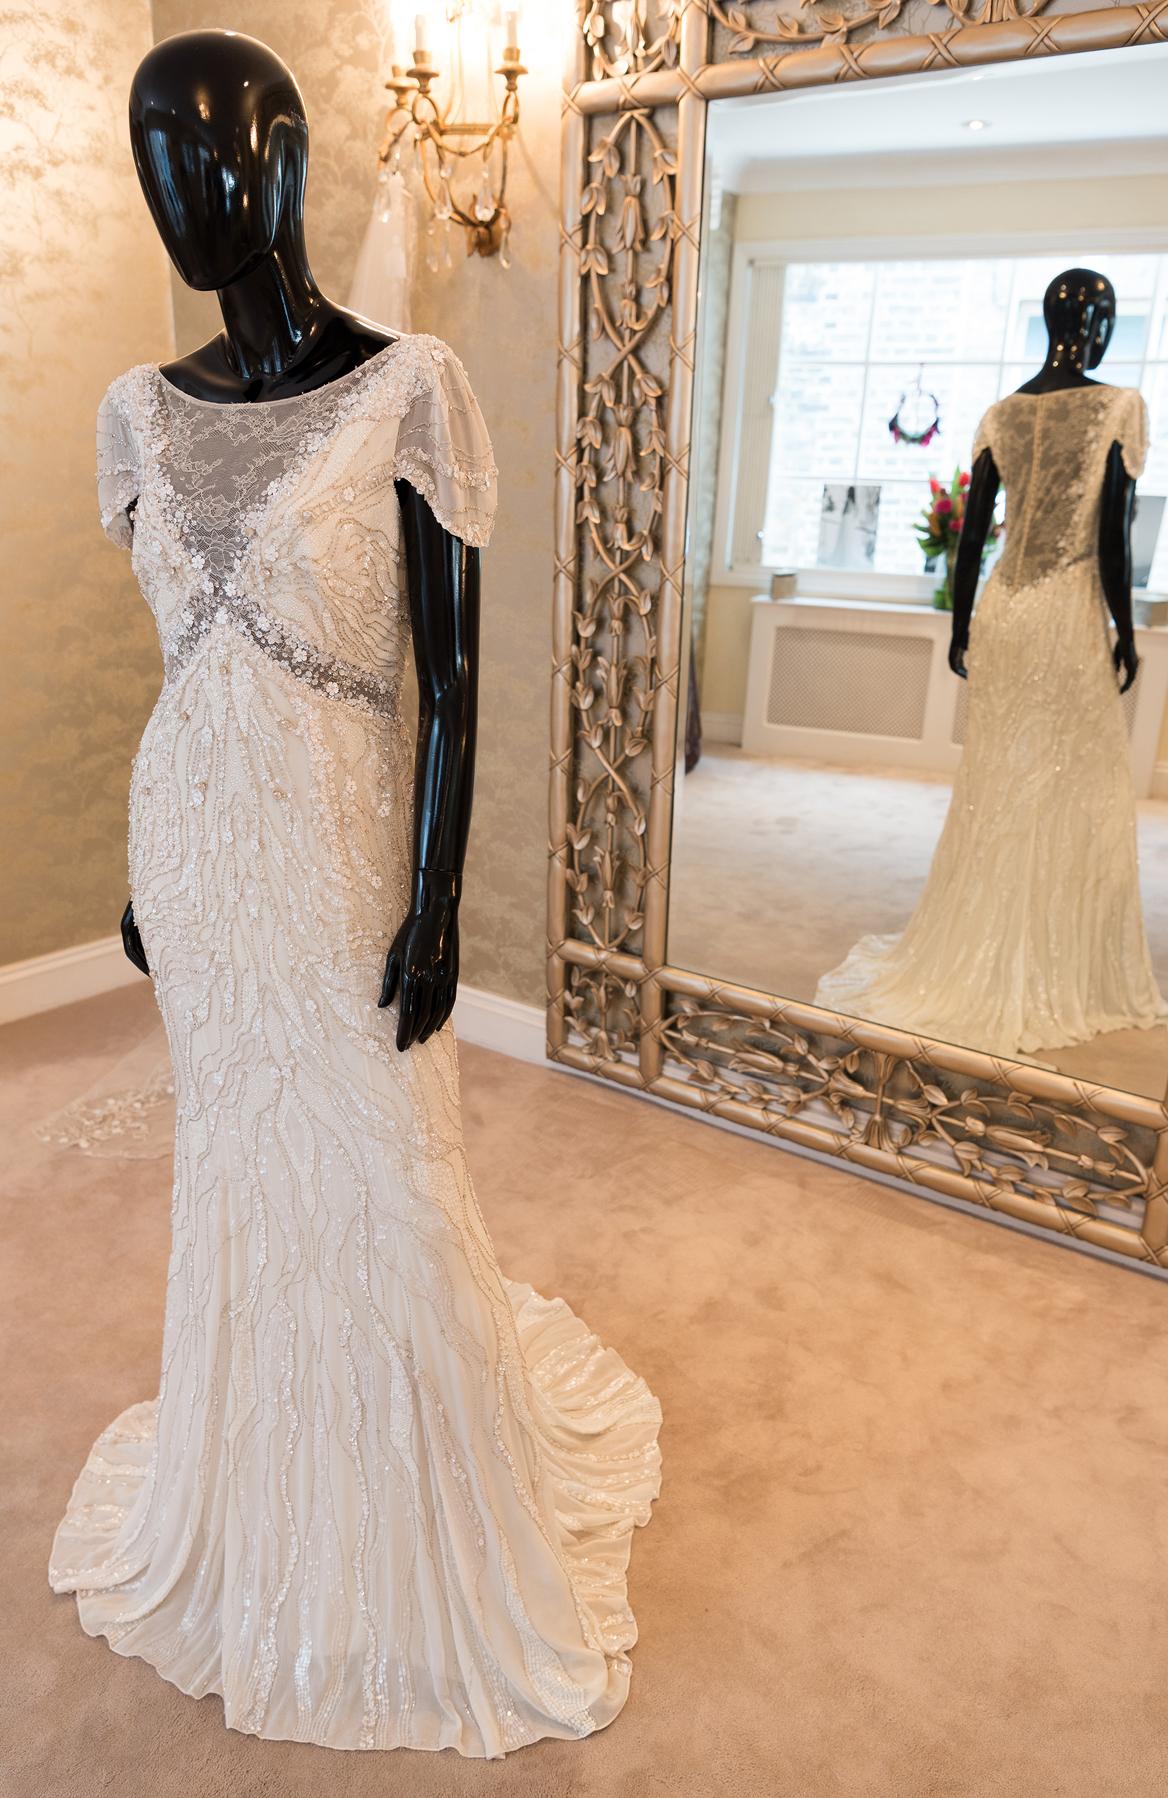 Blackburn Bridal Pop Up Sample Sale Shop Open 8th 15th 22nd And